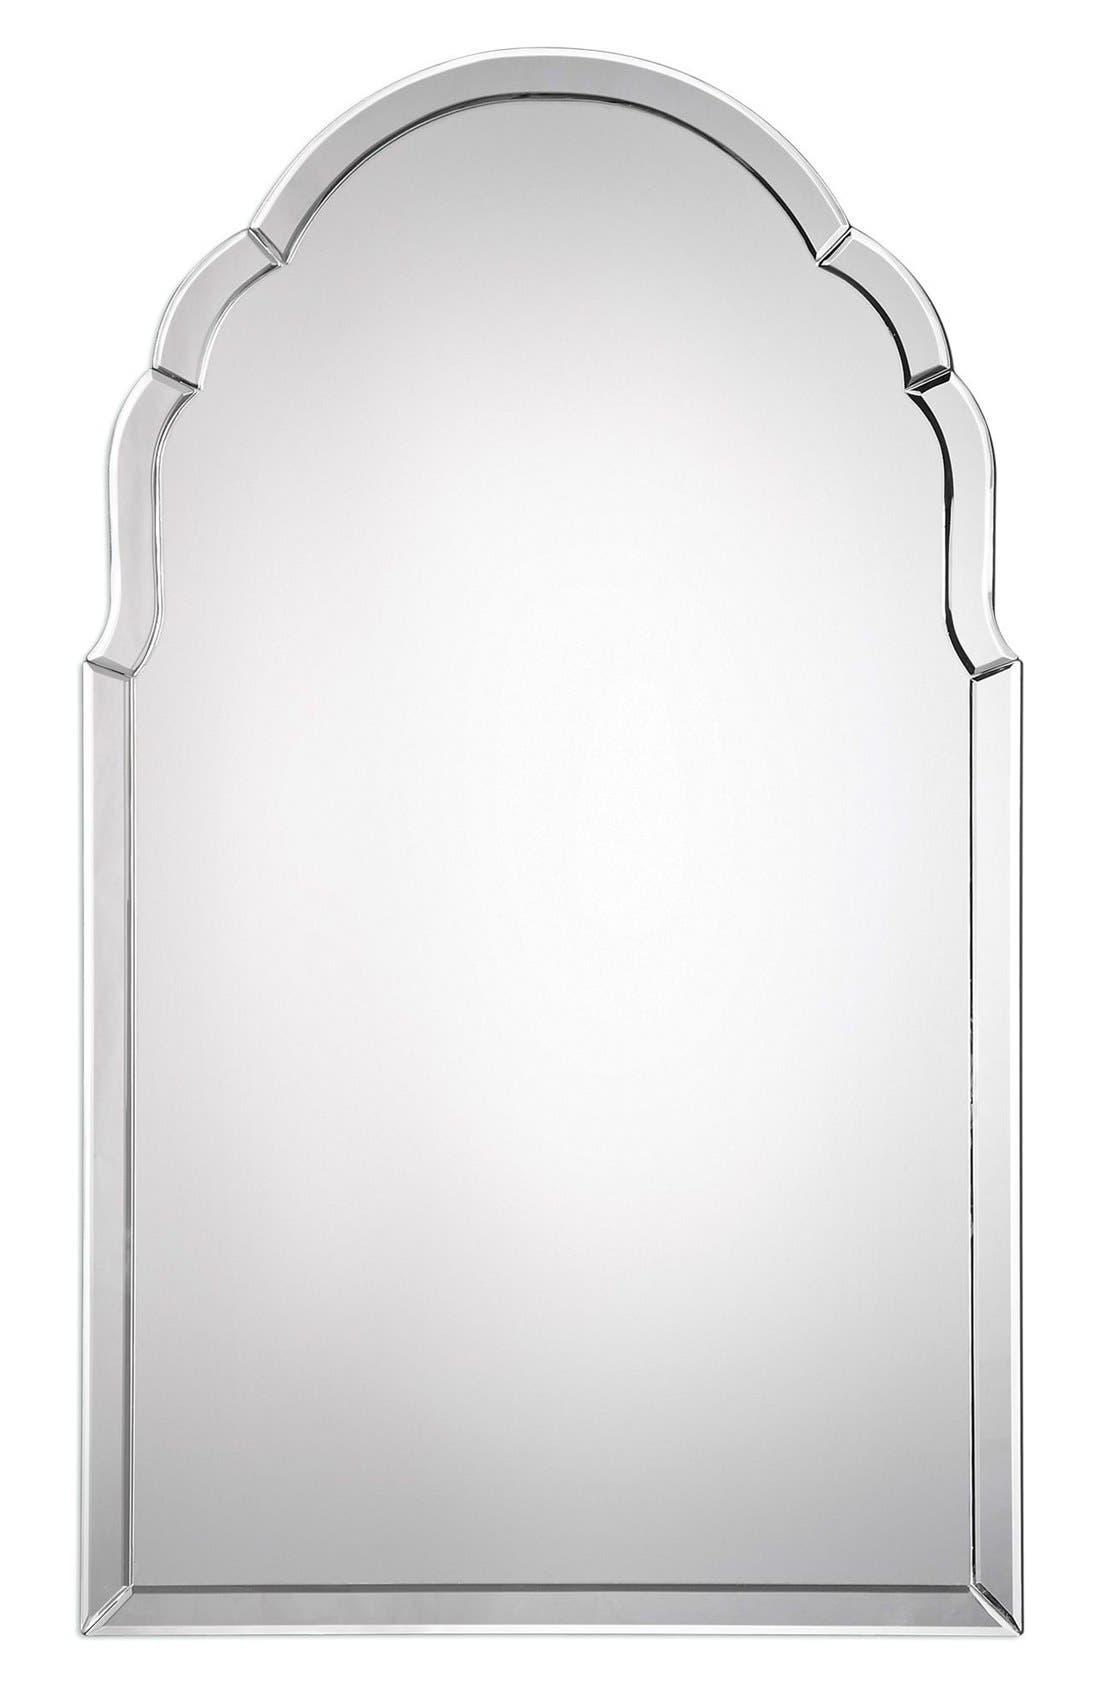 Alternate Image 1 Selected - Uttermost Frameless Arch Mirror